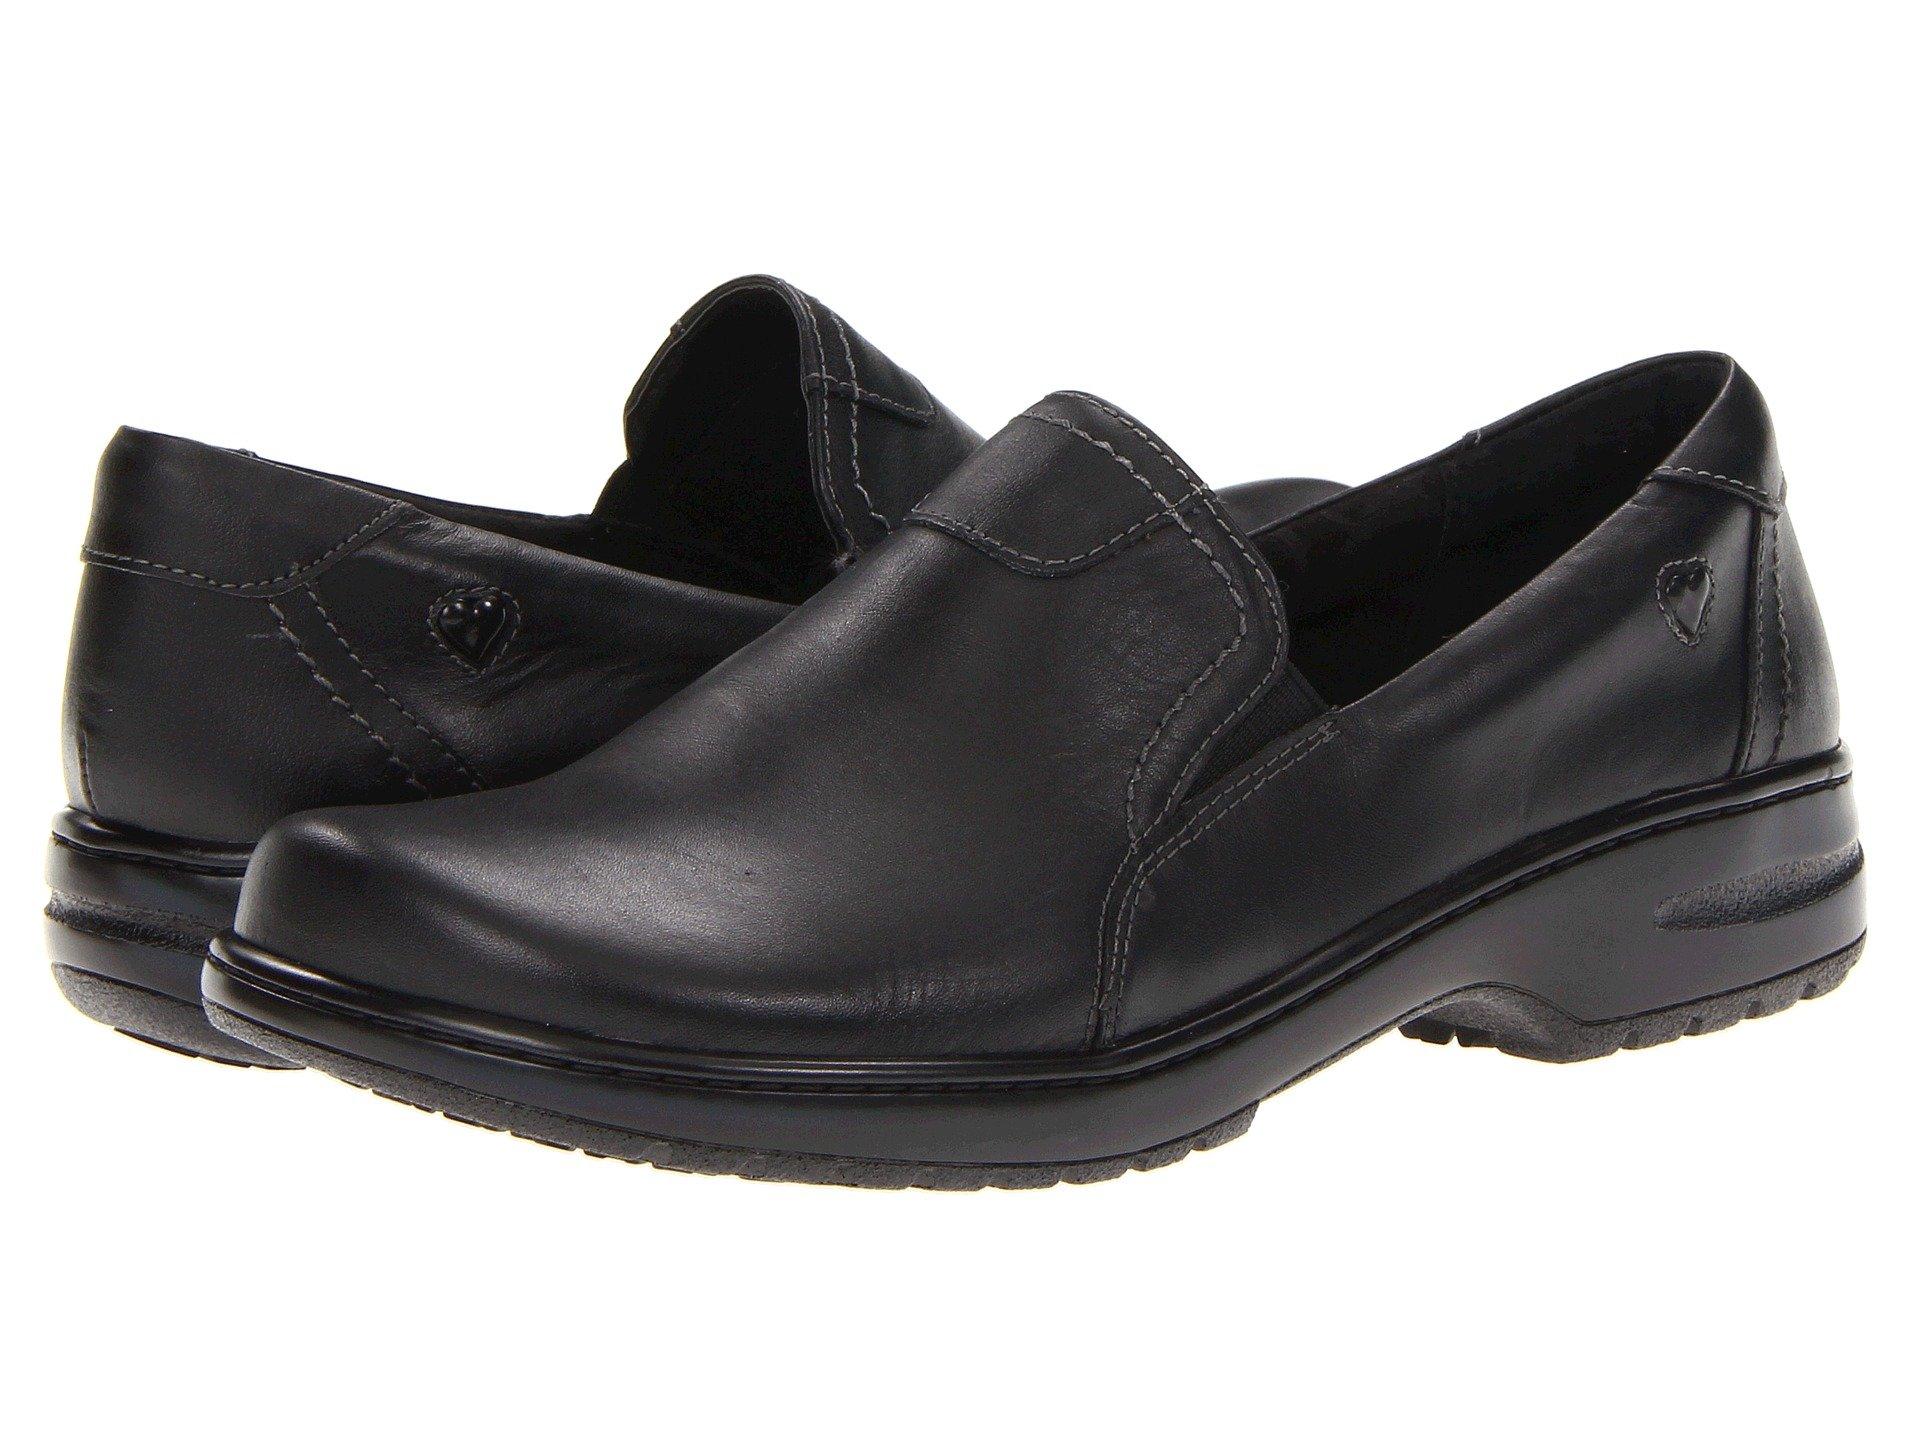 p com comforter women cherokee ckharmony shoes s footwear womenaposs nursing antimicrobial allheart harmony shoe comfortable ck by nurse